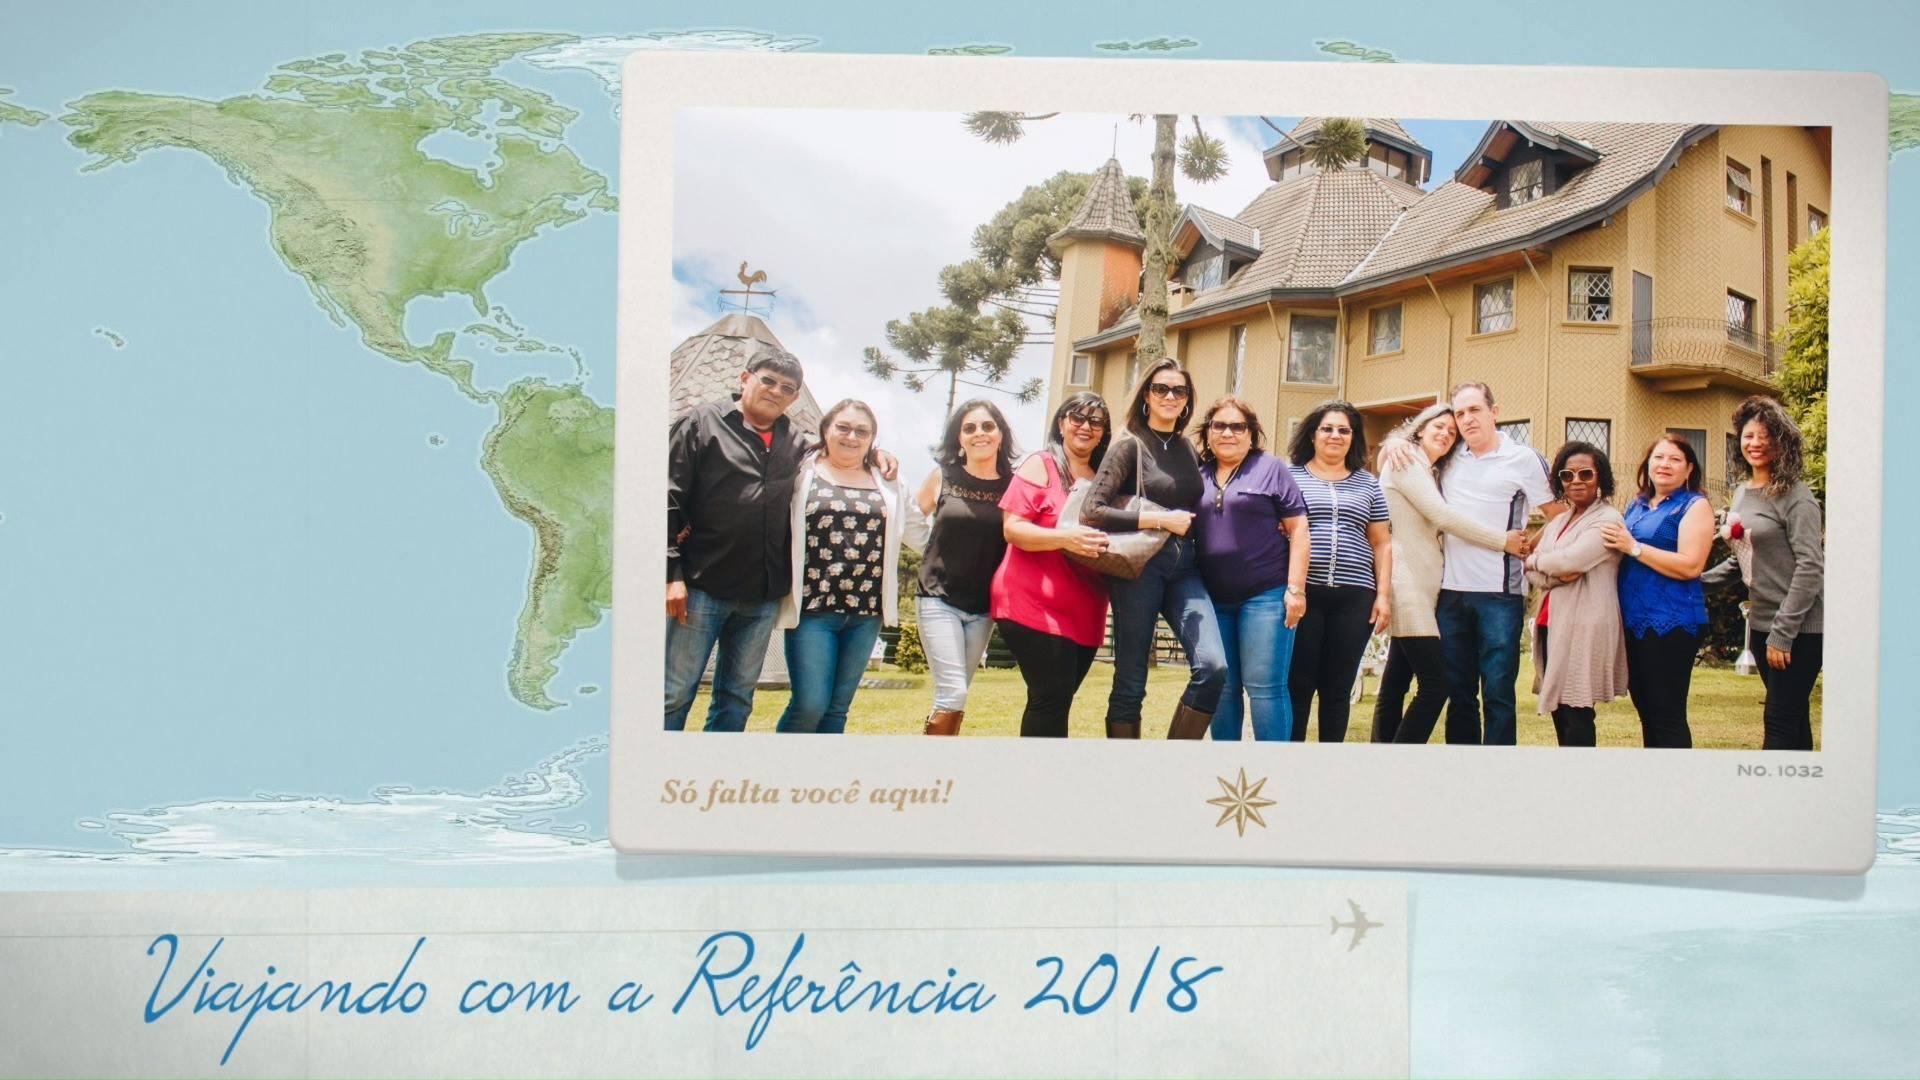 Viajando com a Referência 2018